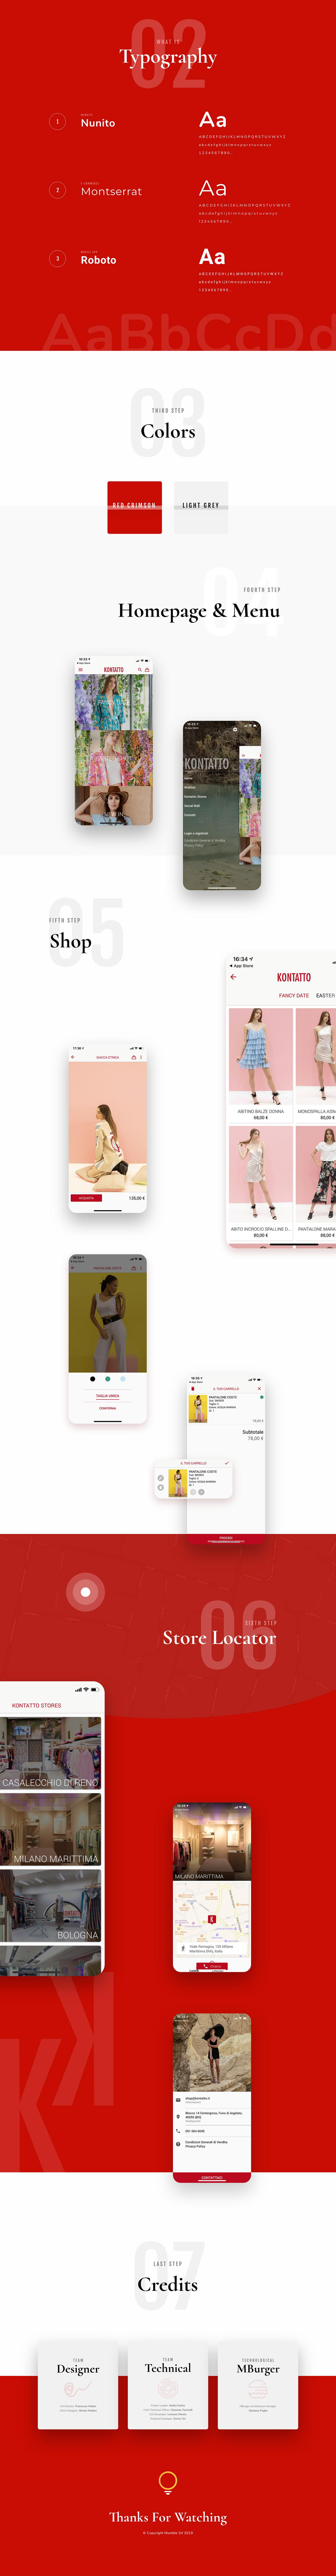 app iOS  App android ux/ui design mumble Fashion  clothes Mburger kontatto